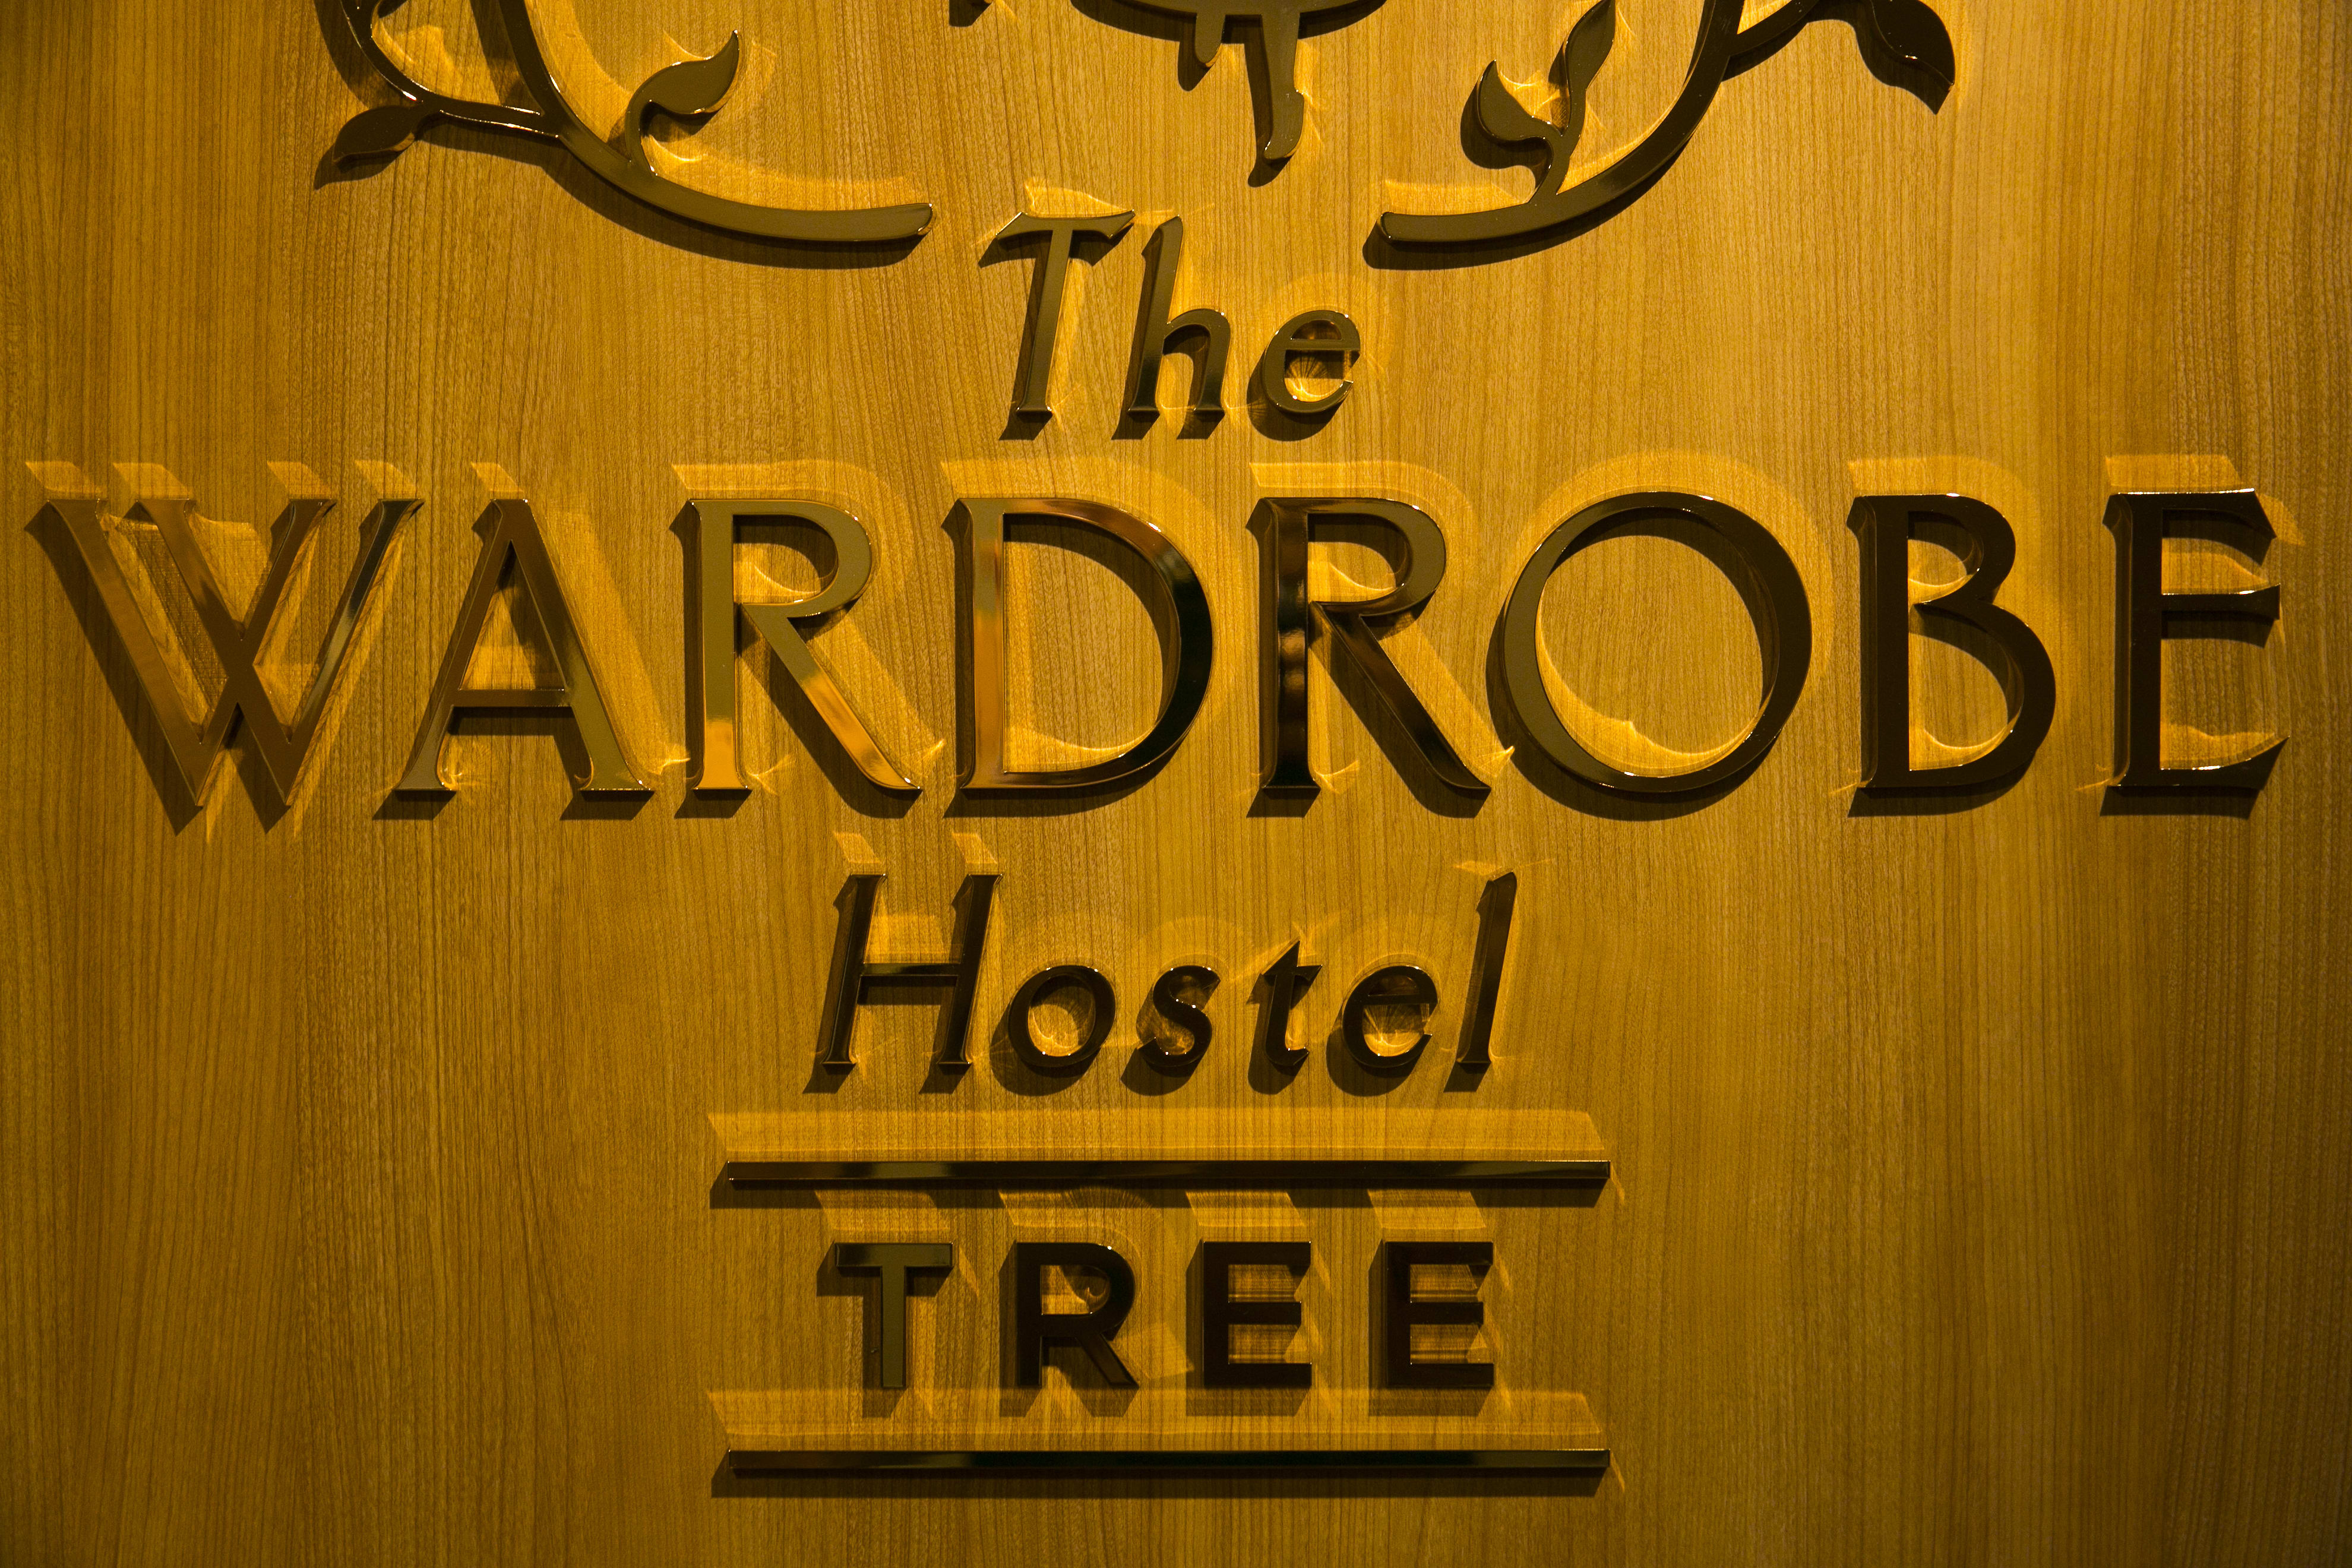 HOSTEL - The Wardrobe Hostel Tree